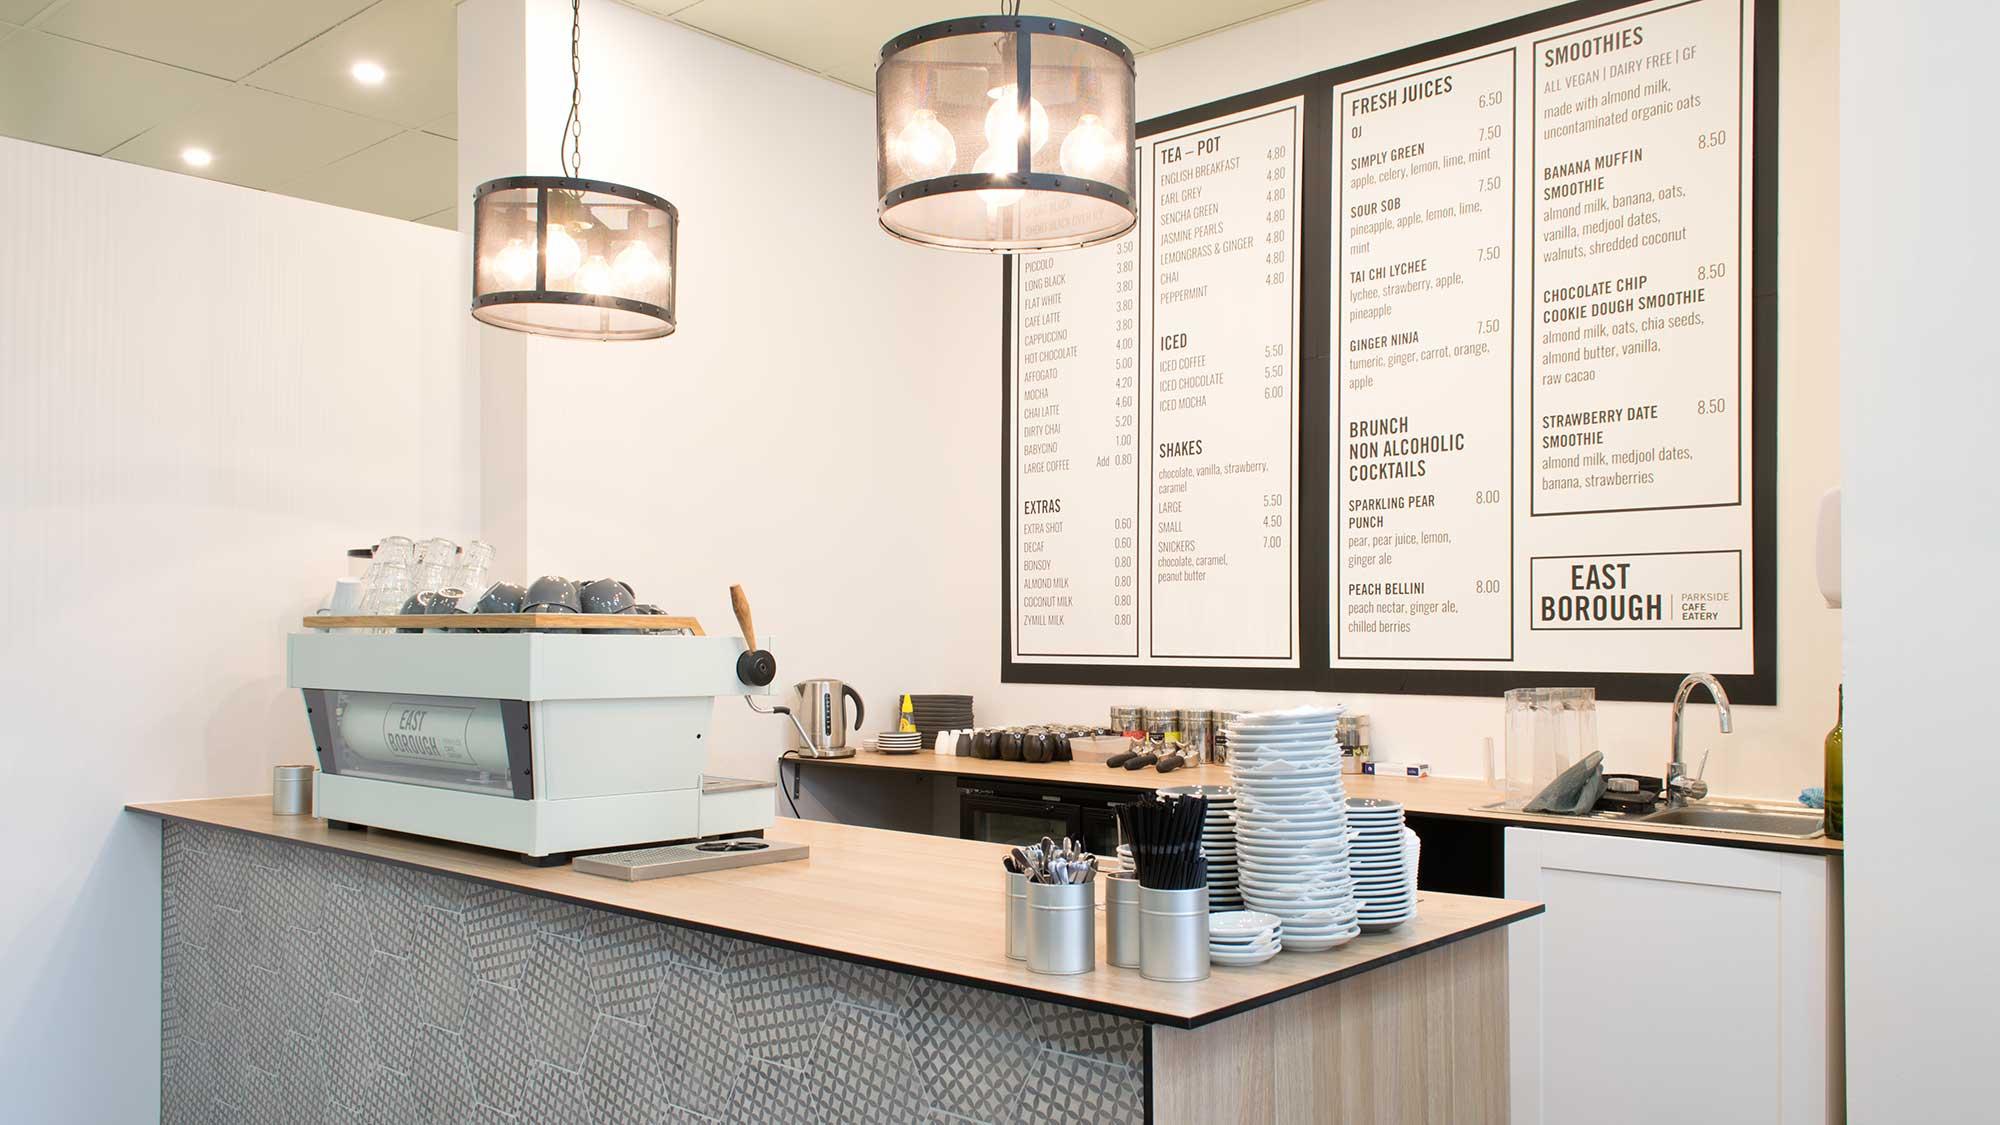 East Borough Cafe